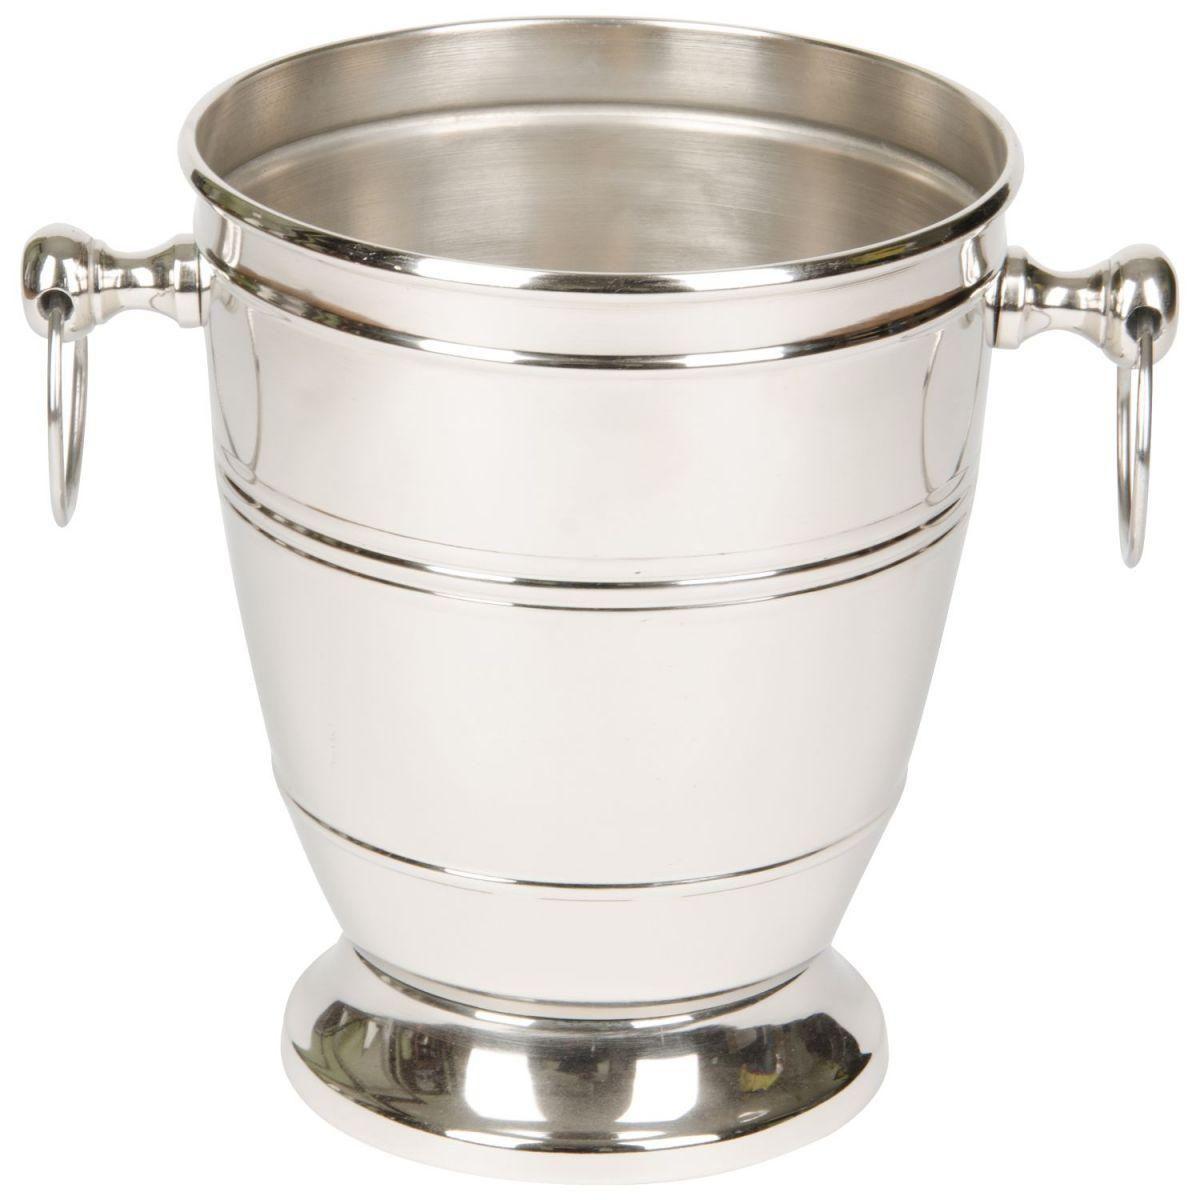 ice bucket nickel plated hg 18 16 cm